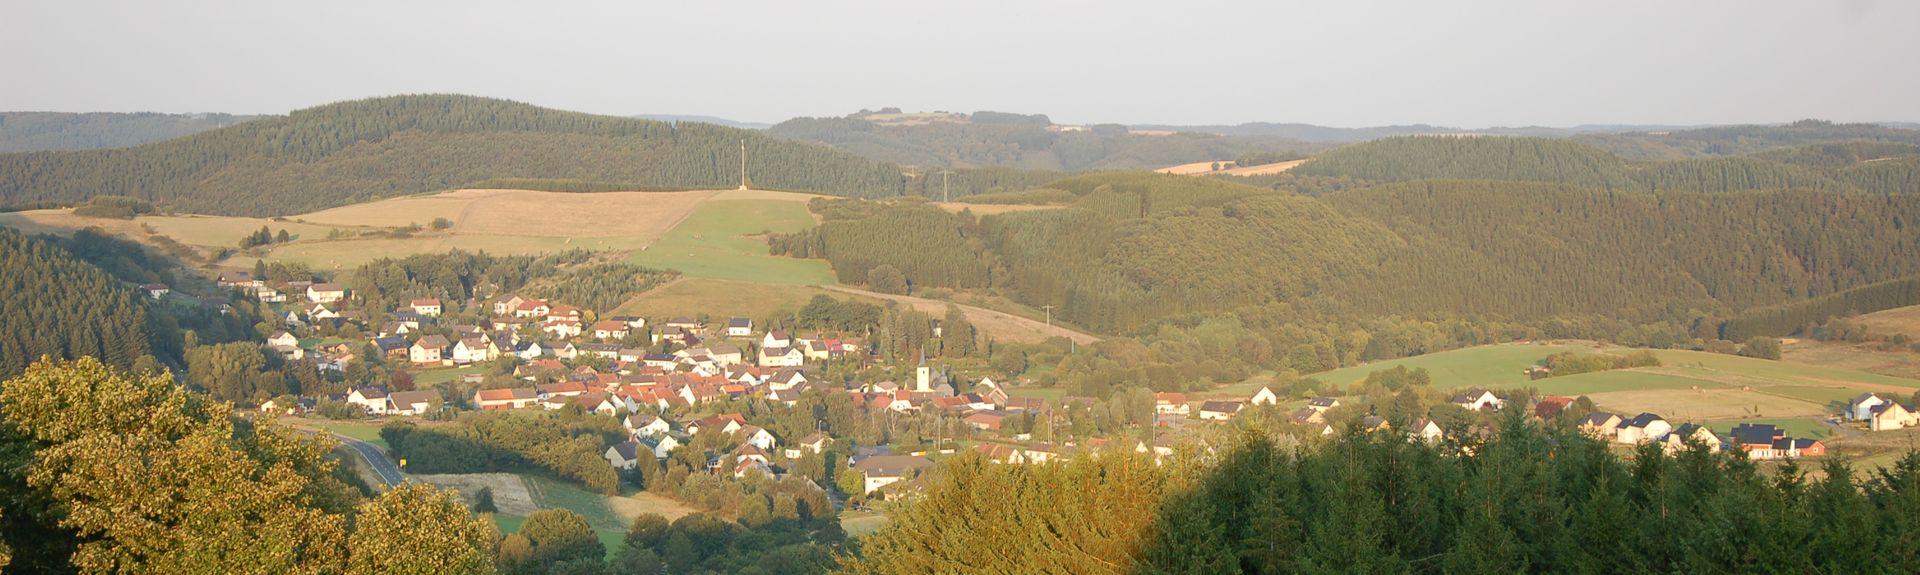 Gerolstein, Rhineland-Palatinate, Germany